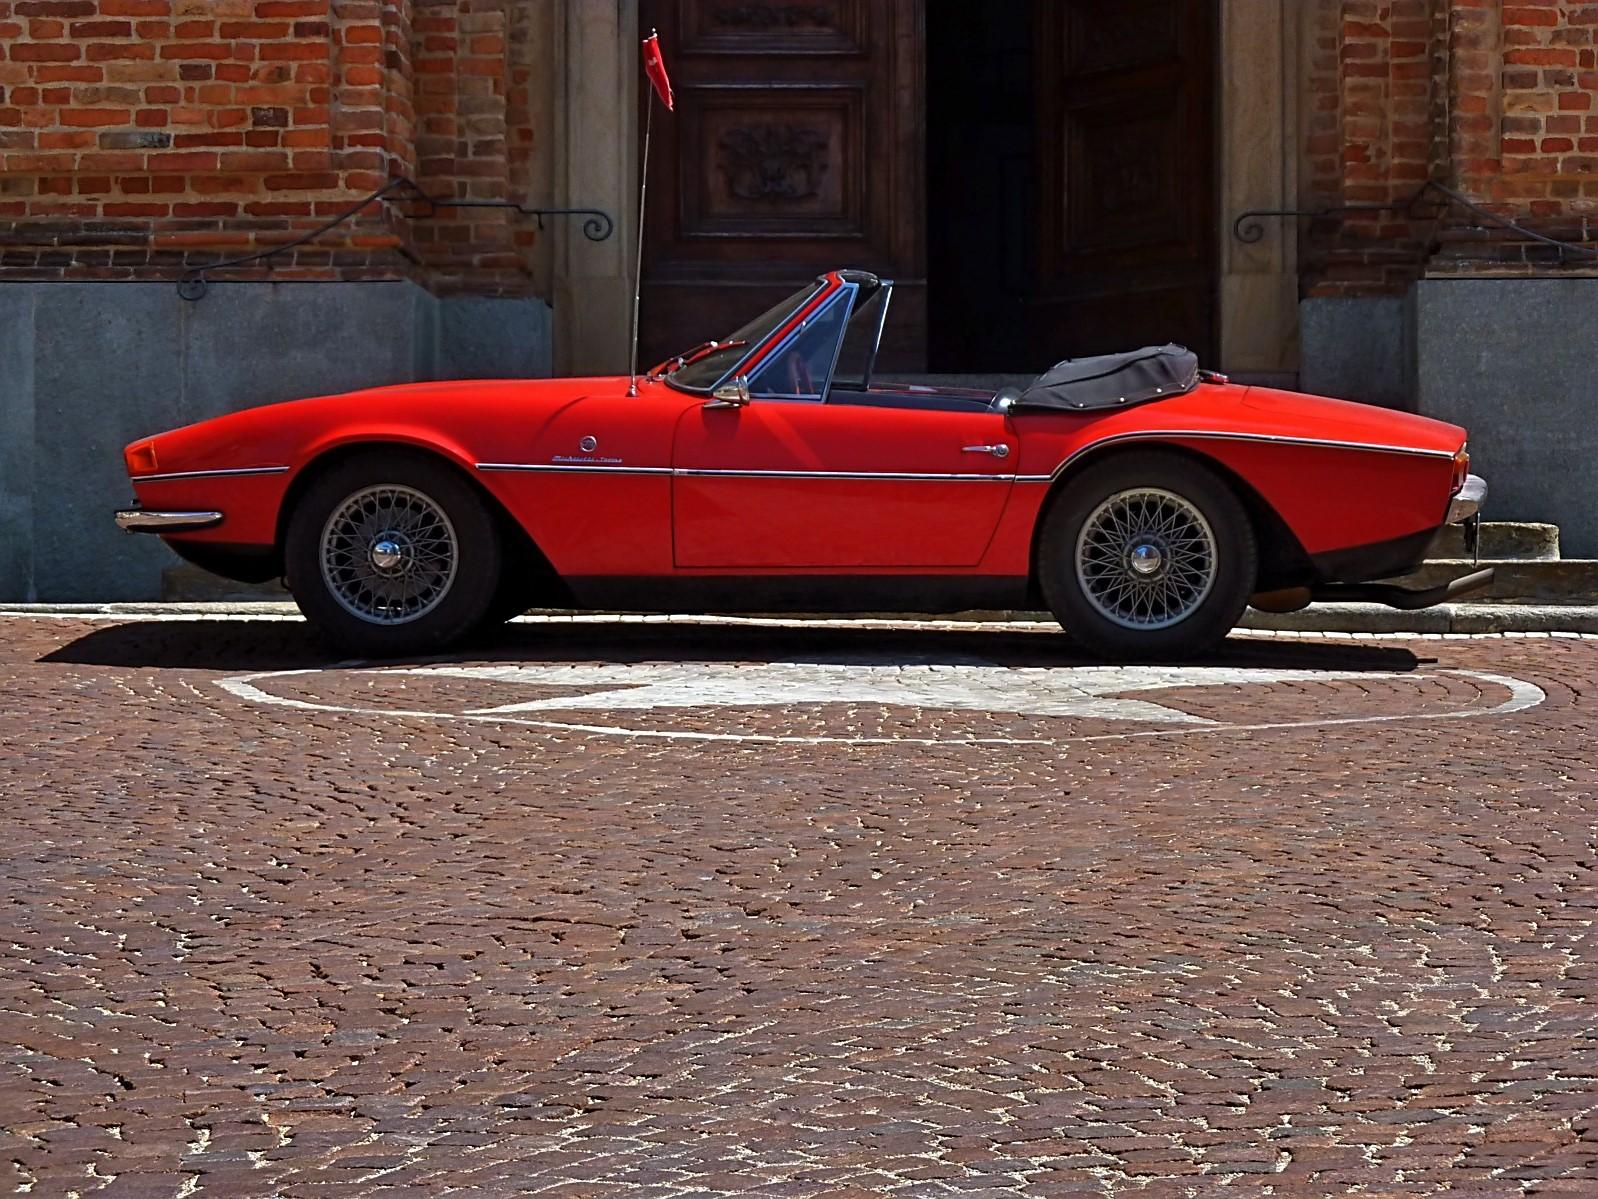 1968 Michelotti TR5 Ginevra Prototype (53)